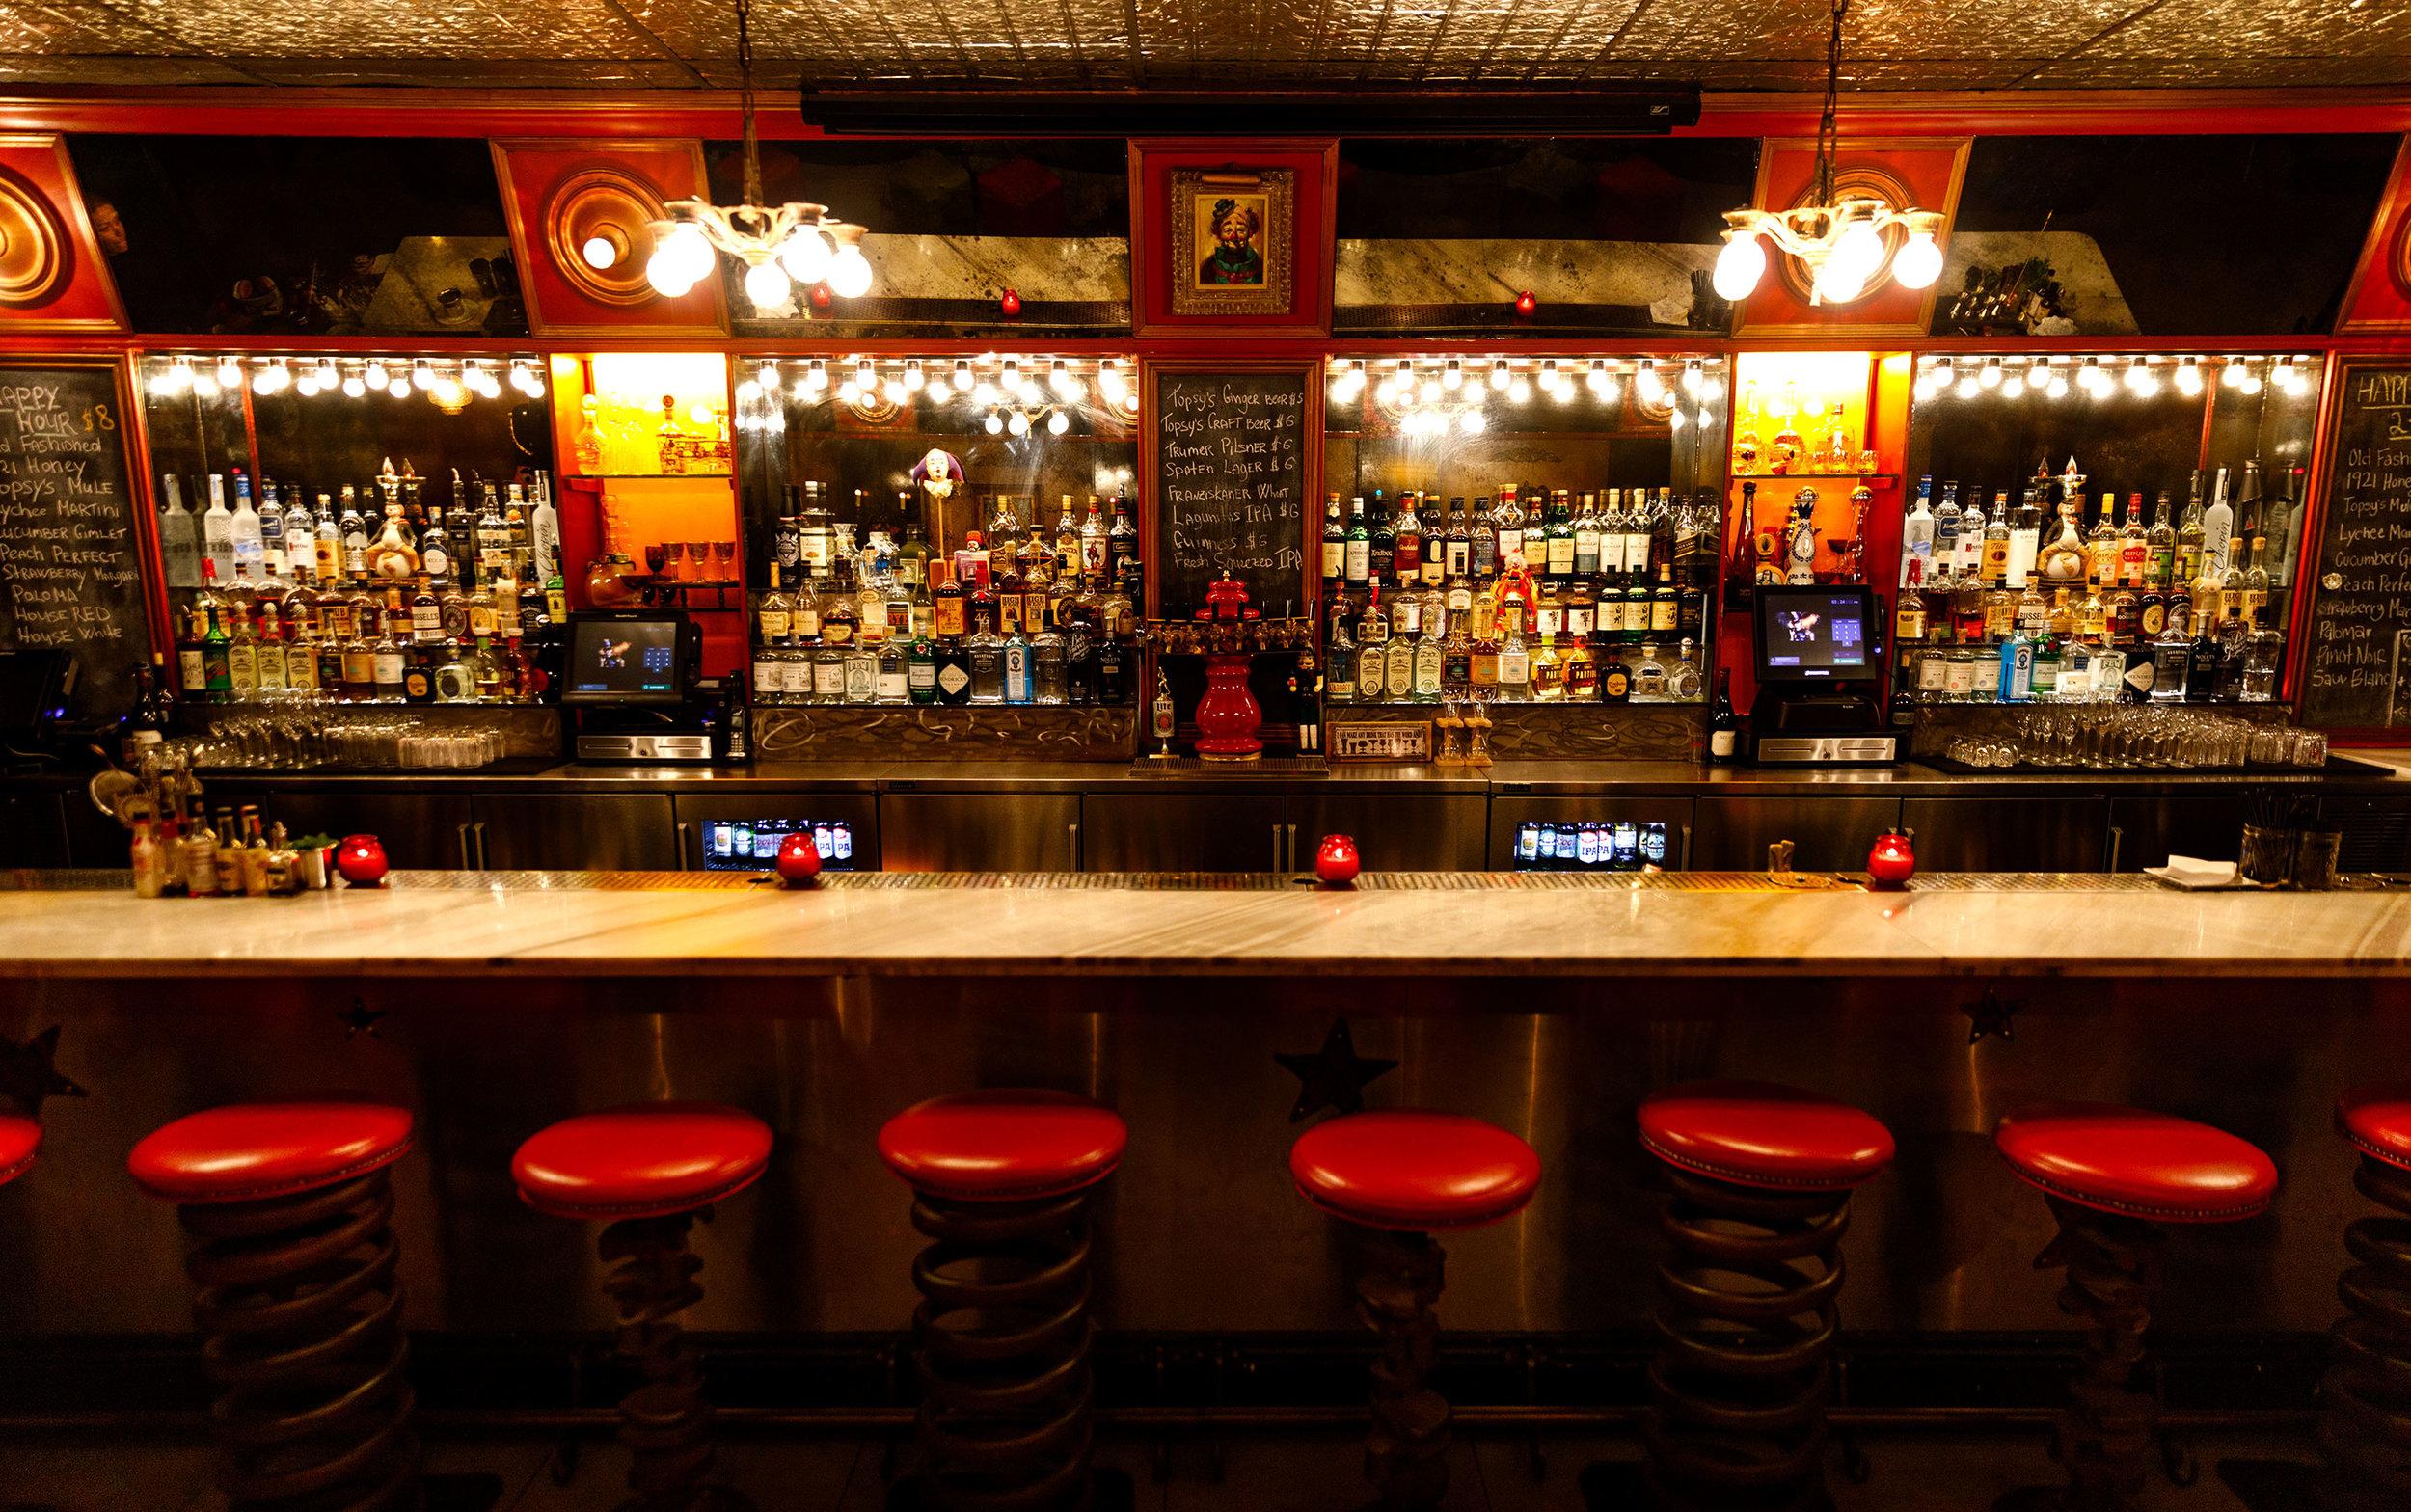 Topsy's Bar